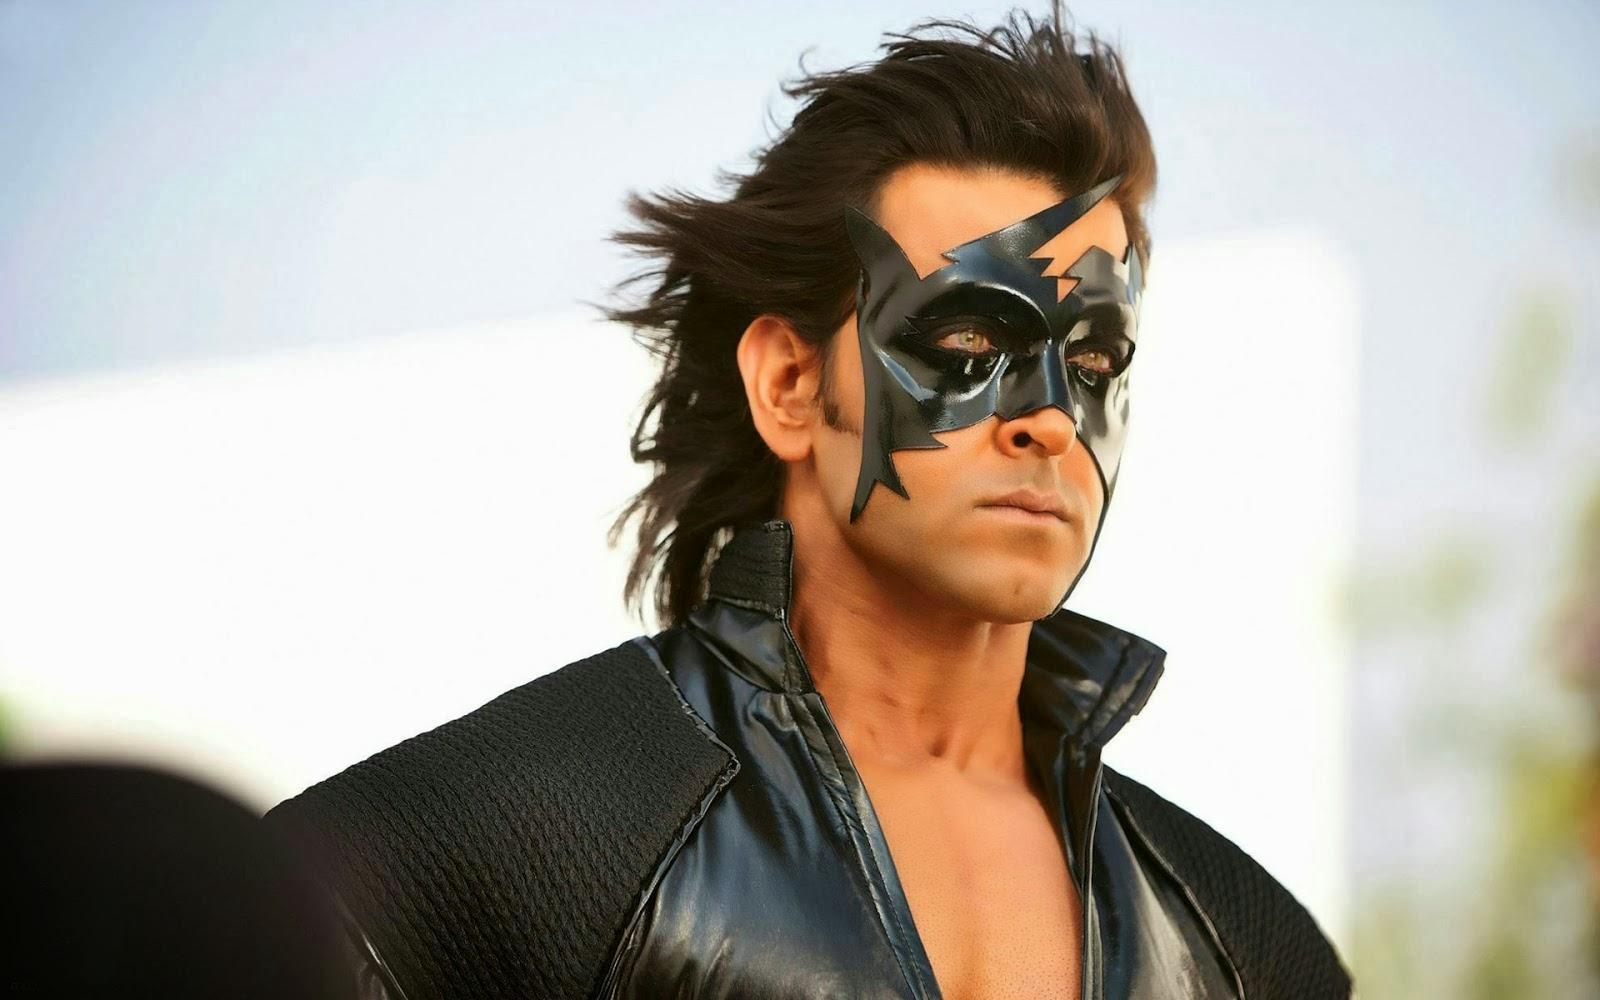 Hrithik Roshan Hot HD Wallpapers 1080p | Salman Khan HD Wallpaper